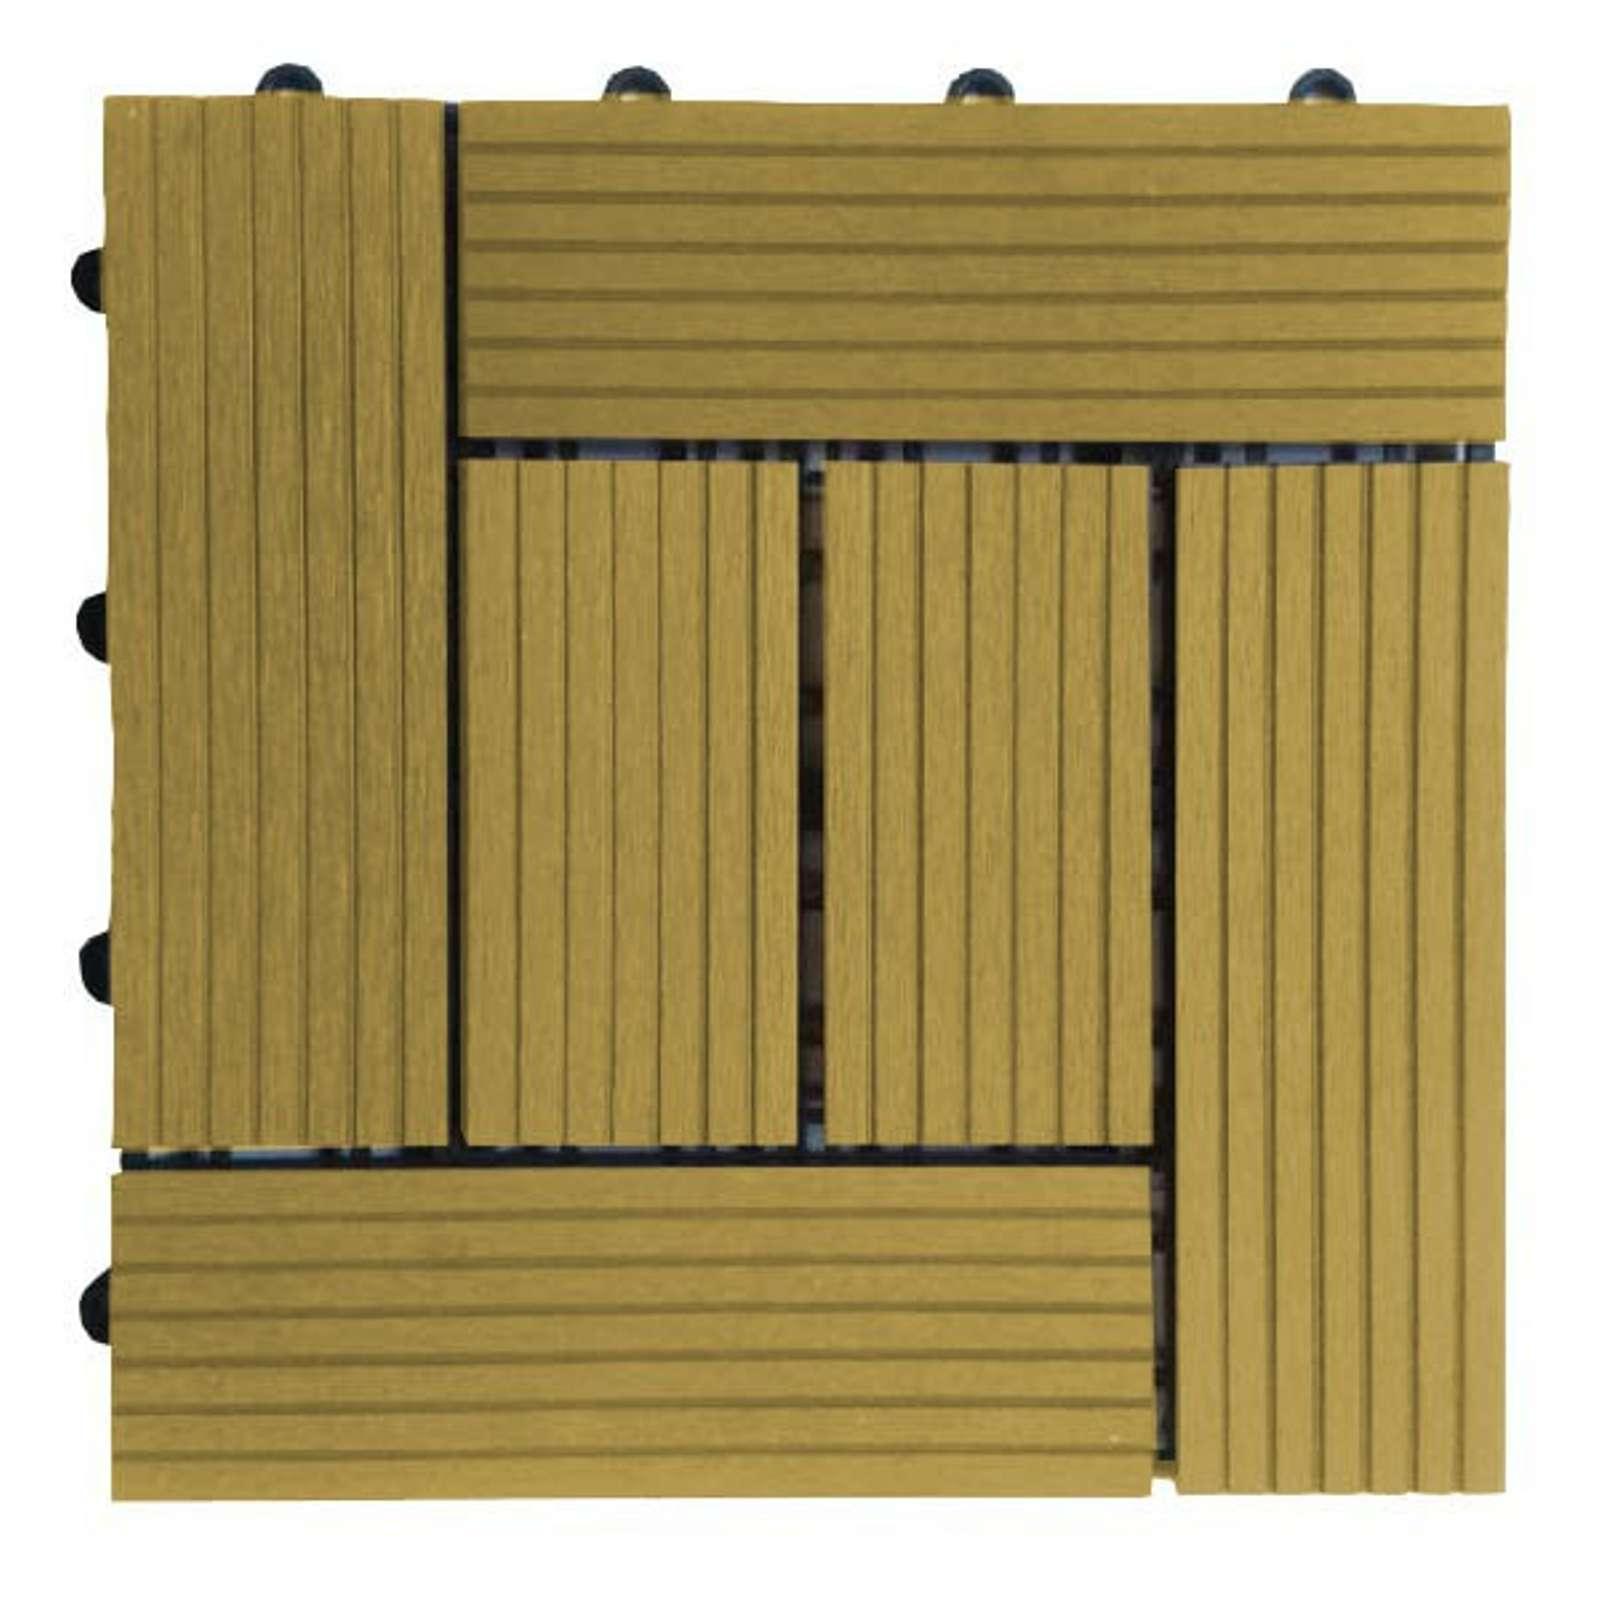 Паркет садовый, СД Гарден, Classic 300х300 мм, (упак 1 м.кв, 11 шт), Дуб